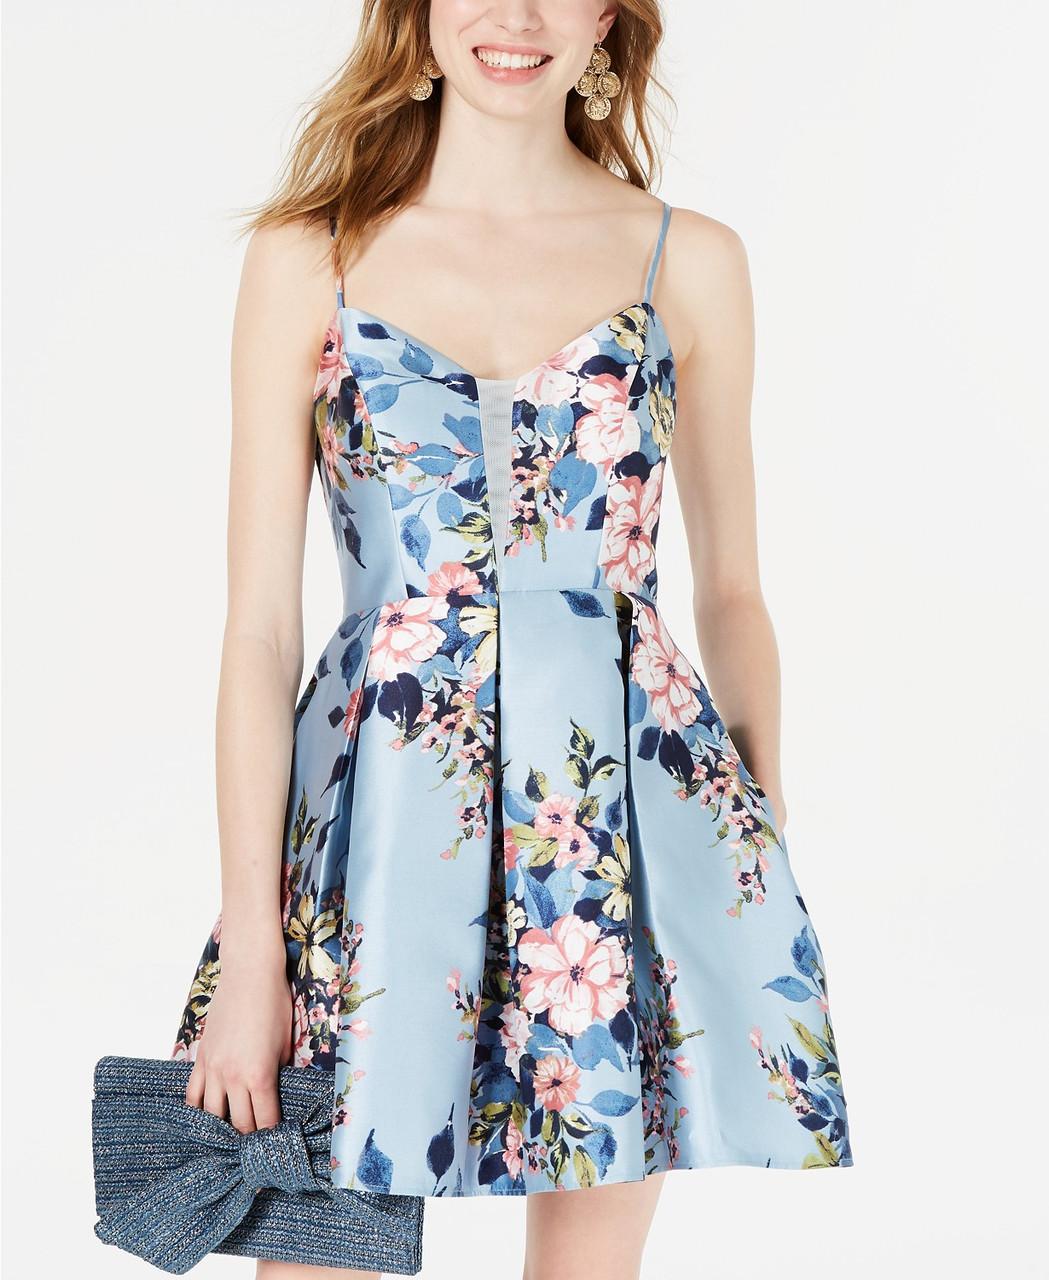 Teeze Me Женское платье - Е2